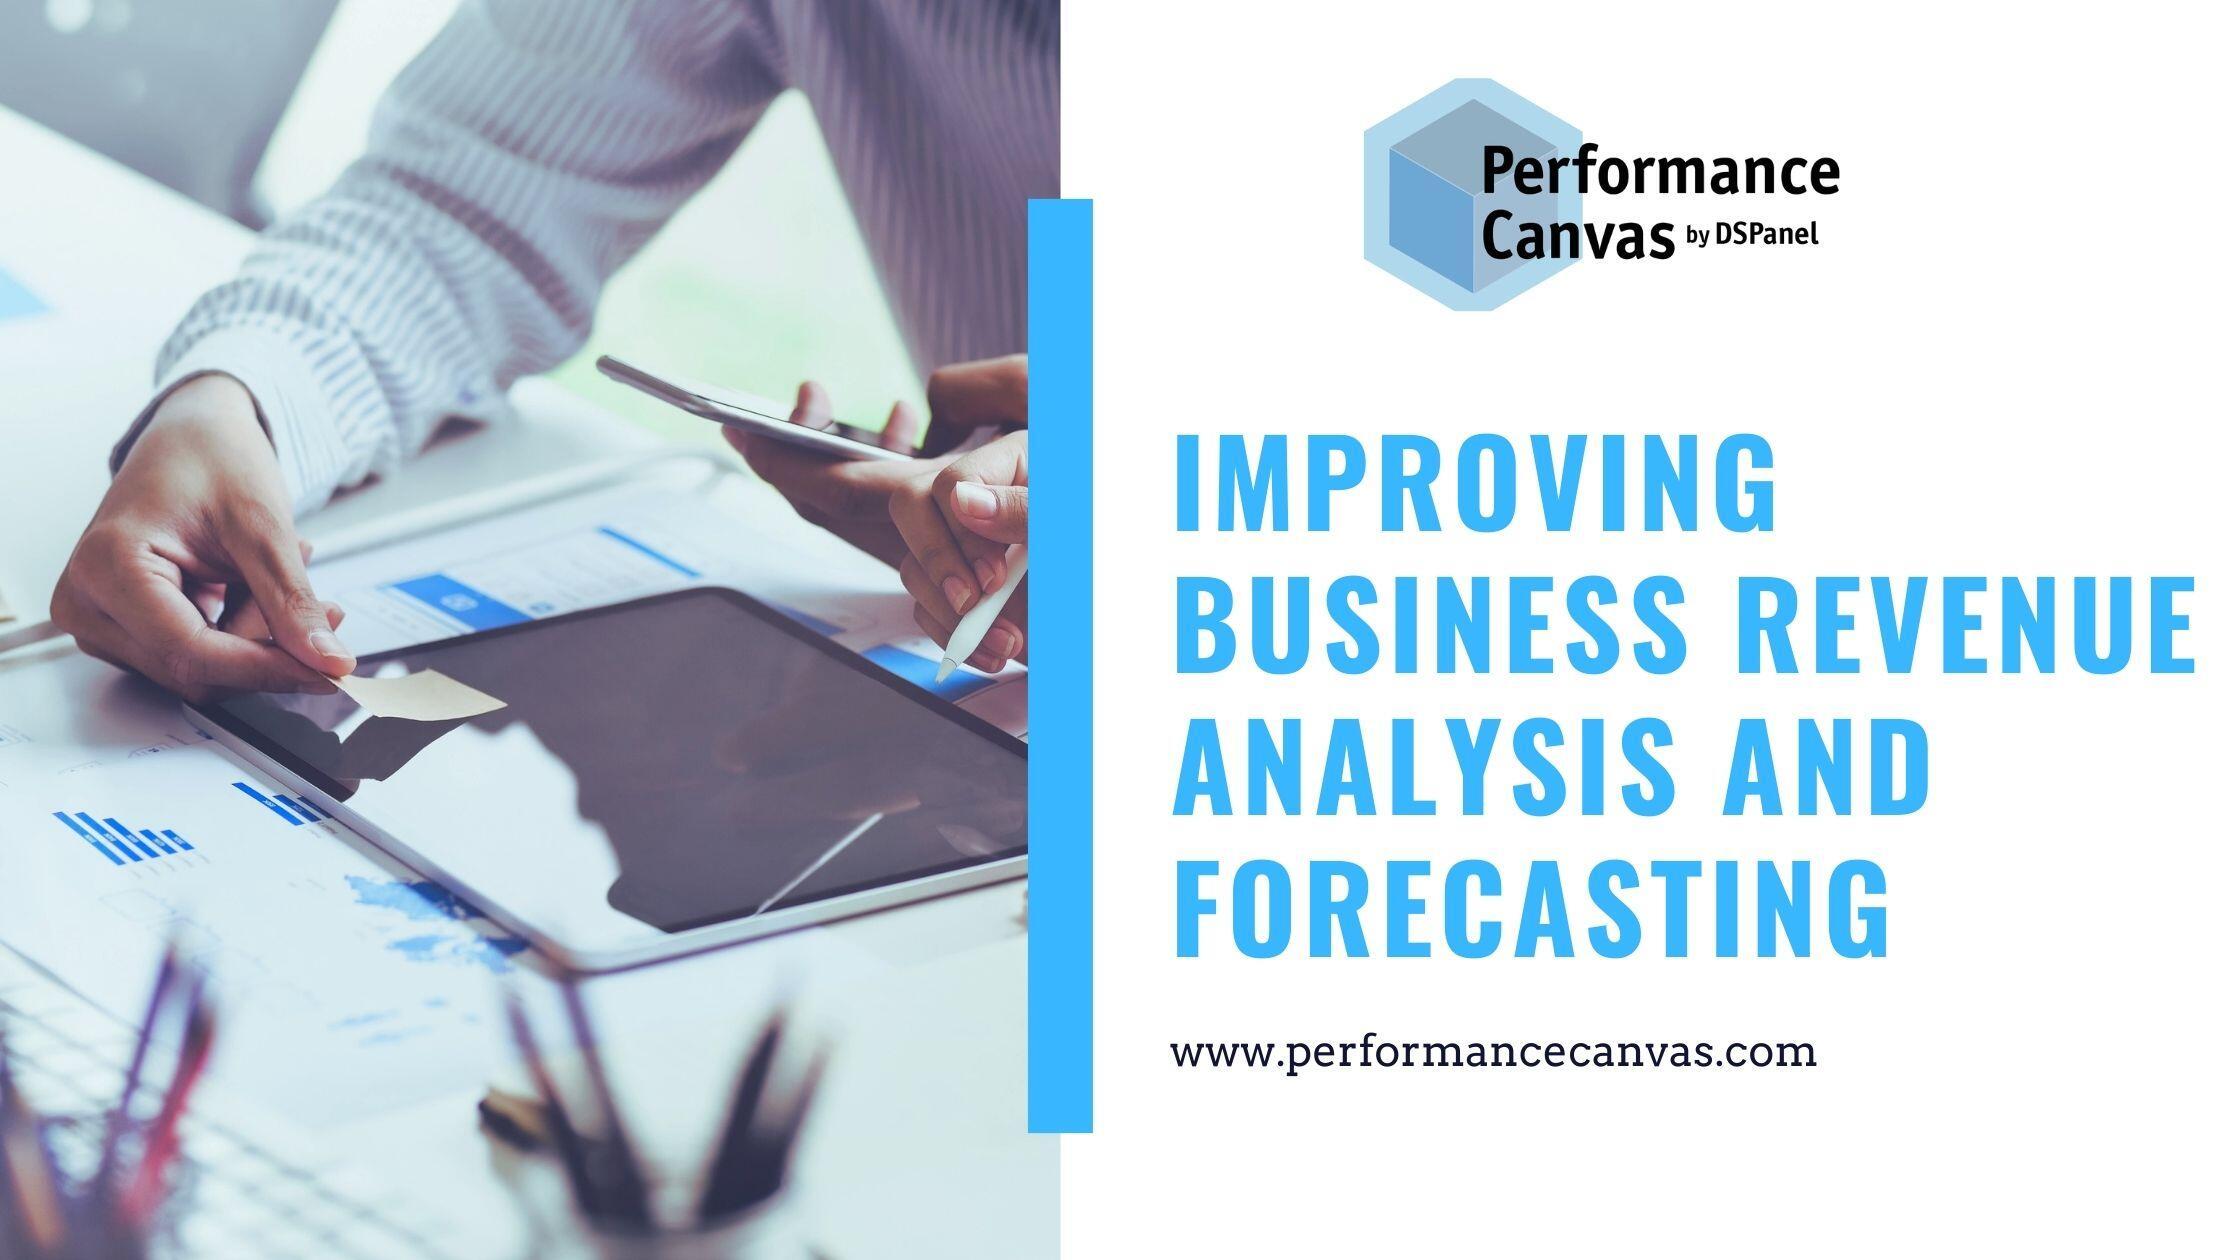 Revenue analysis and forecasting